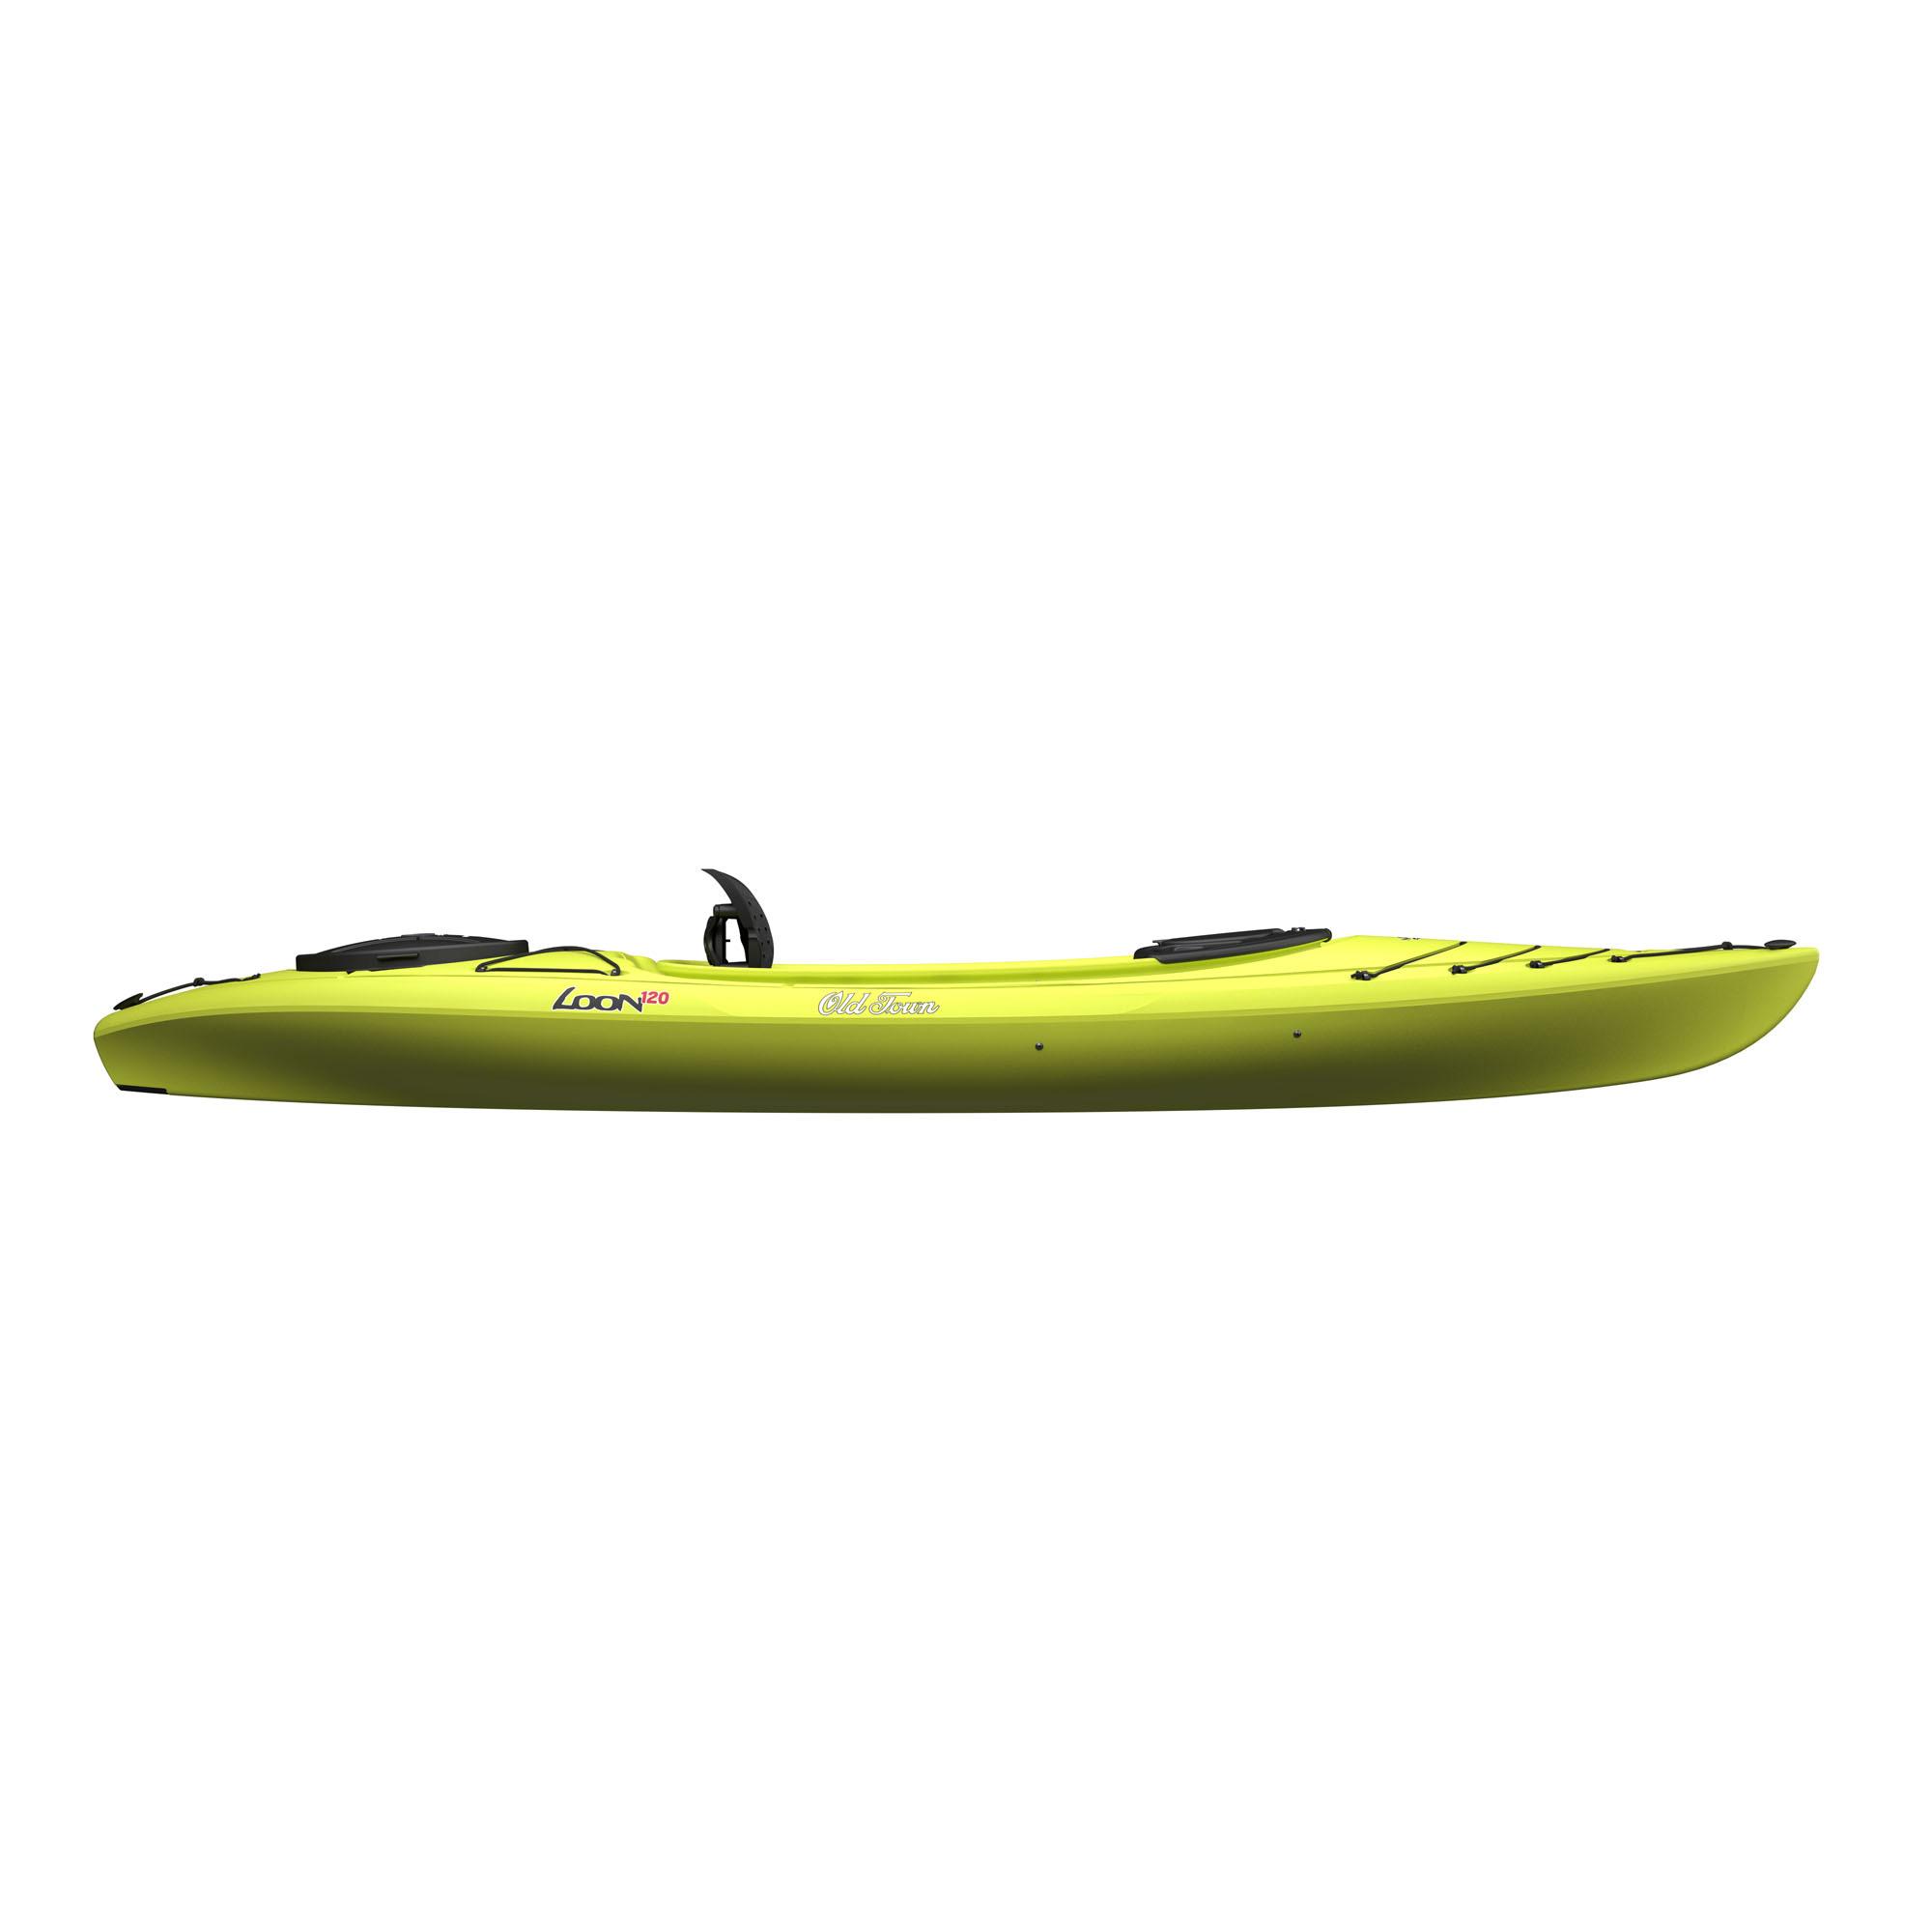 12' Loon 120 Kayak